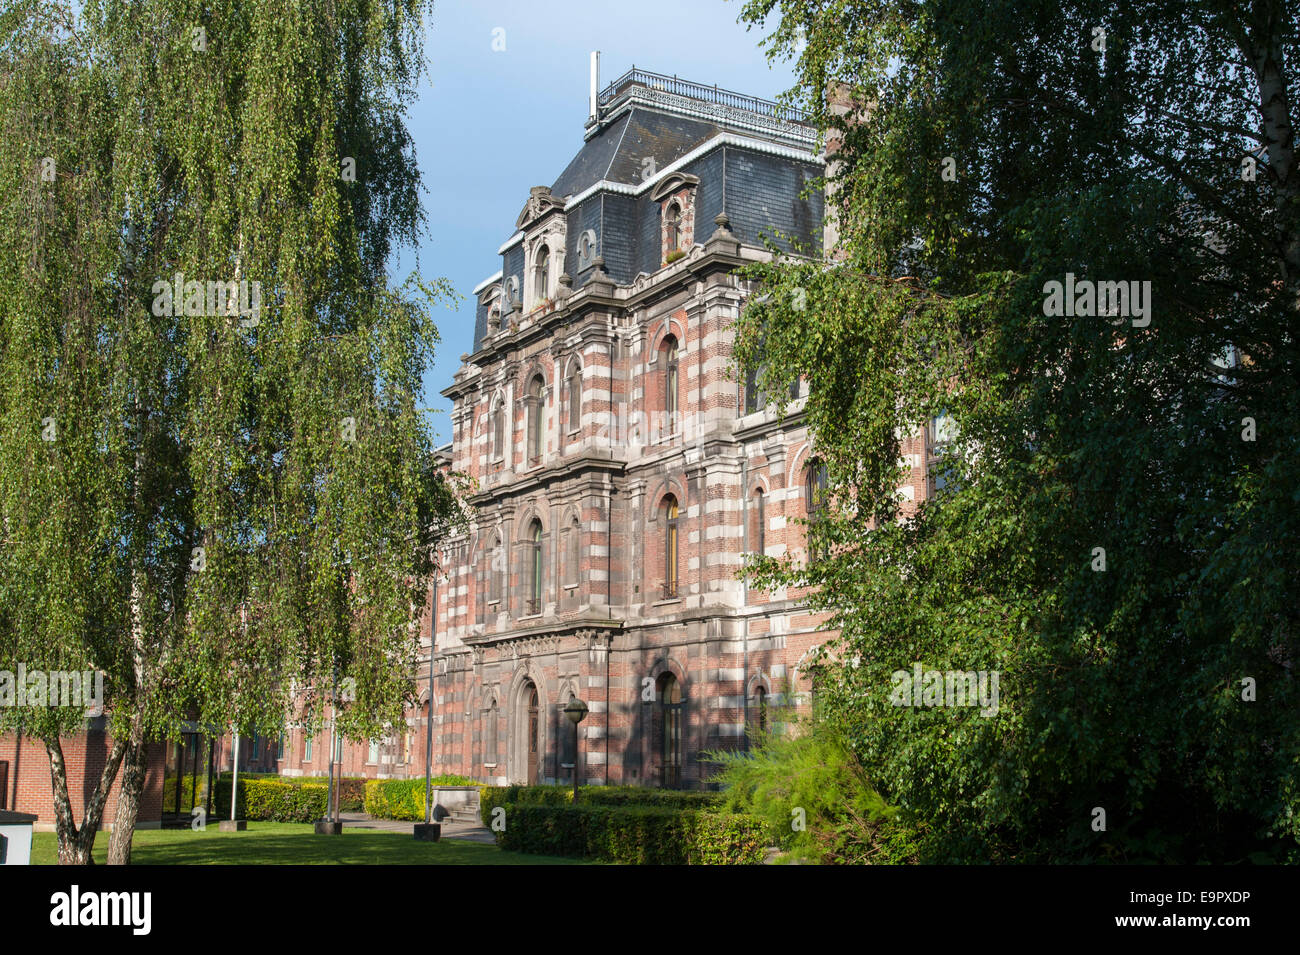 Haute Ecole, Mons, Hennegau, Wallonie, Belgien, Europa | high school, Mons, Hennegau, Wallonie, Belgium, Europe - Stock Image